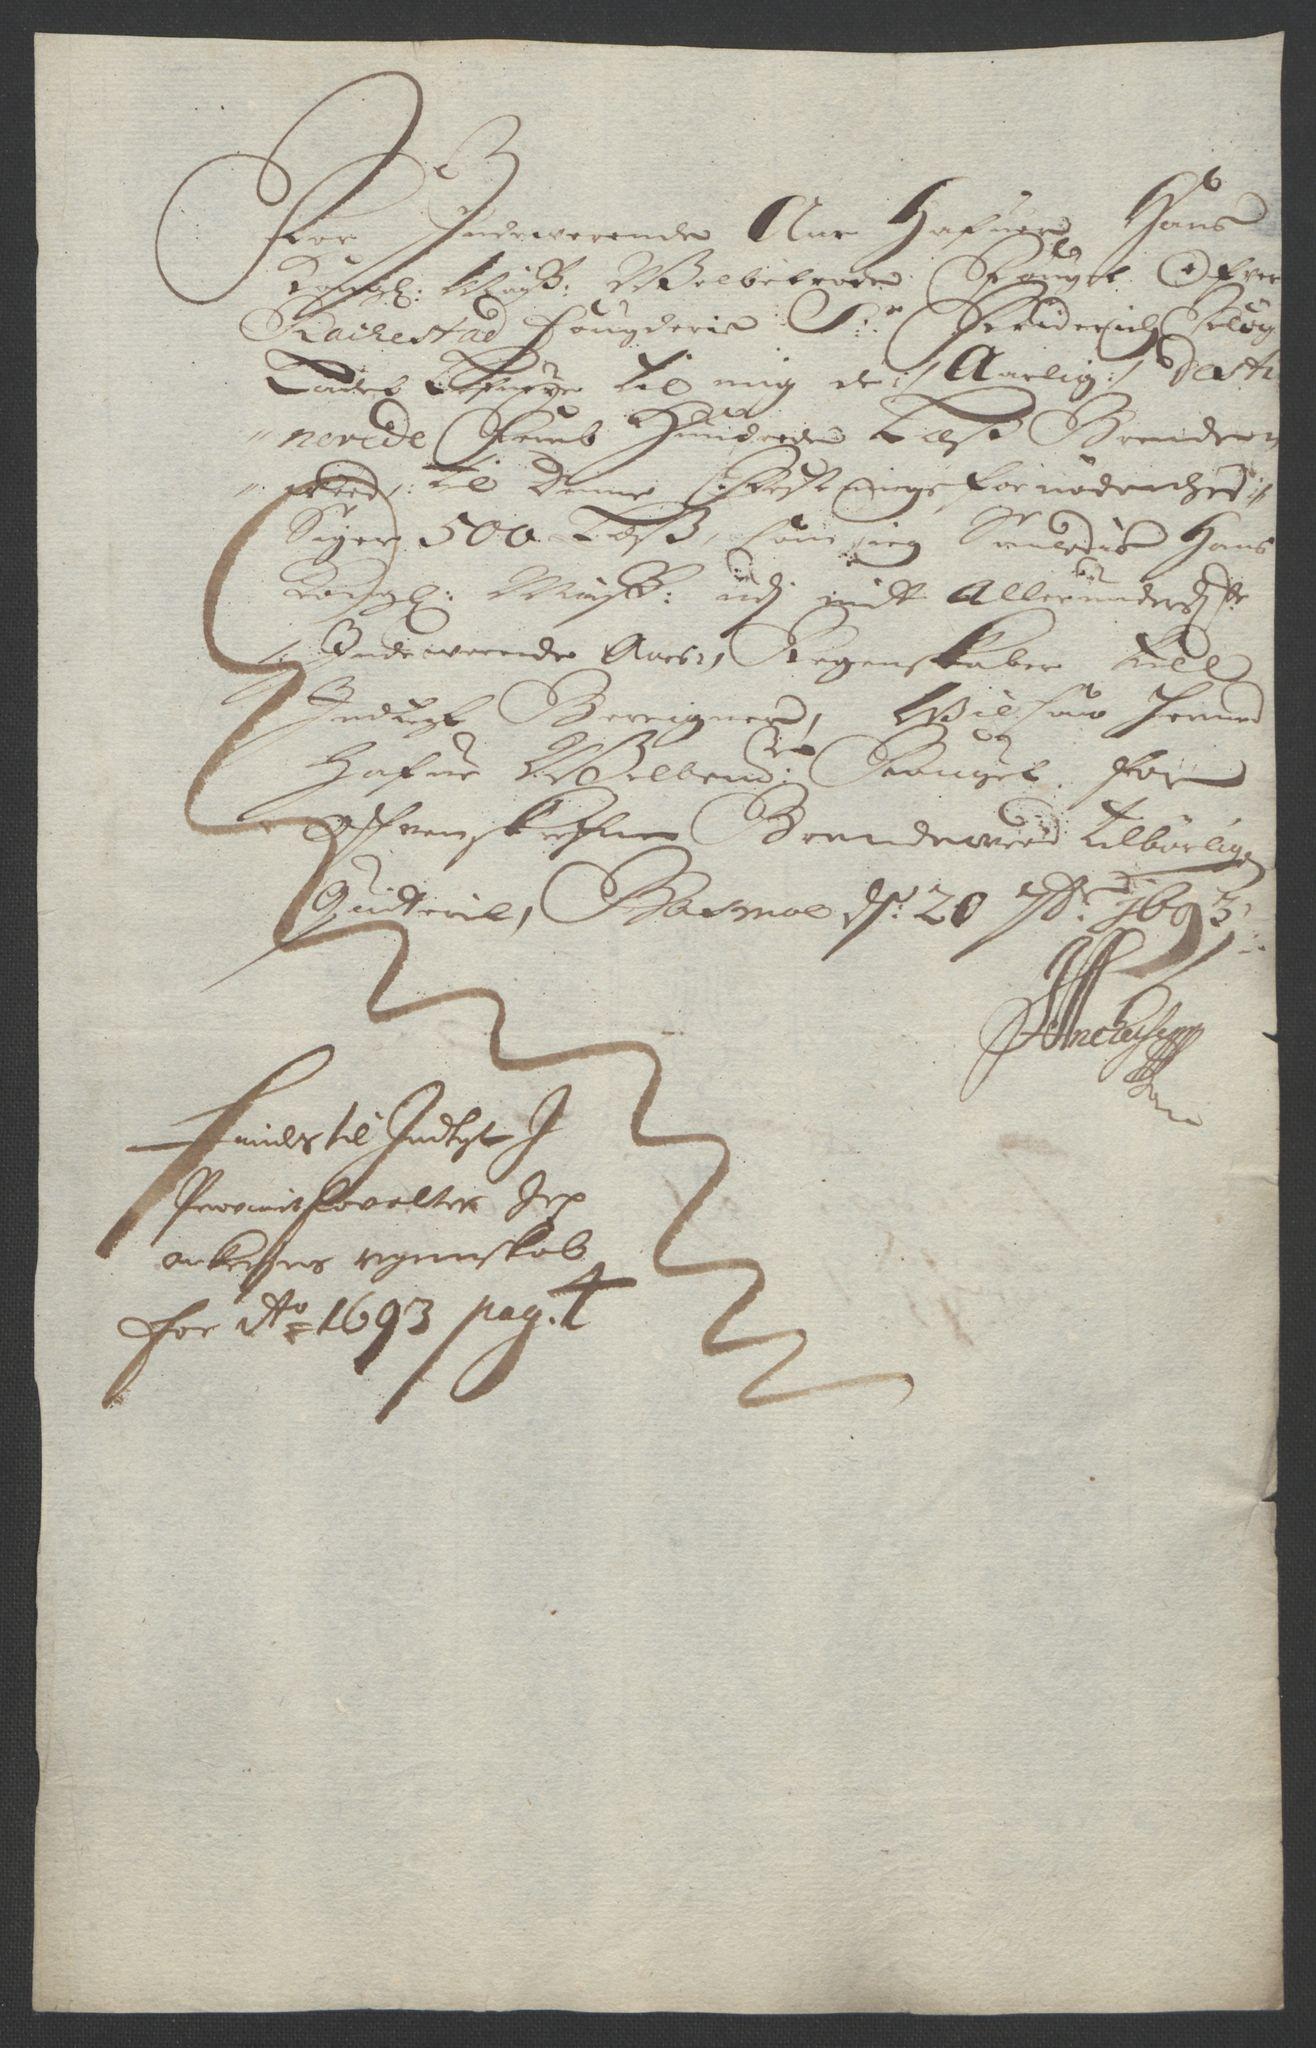 RA, Rentekammeret inntil 1814, Reviderte regnskaper, Fogderegnskap, R05/L0278: Fogderegnskap Rakkestad, 1691-1693, s. 526